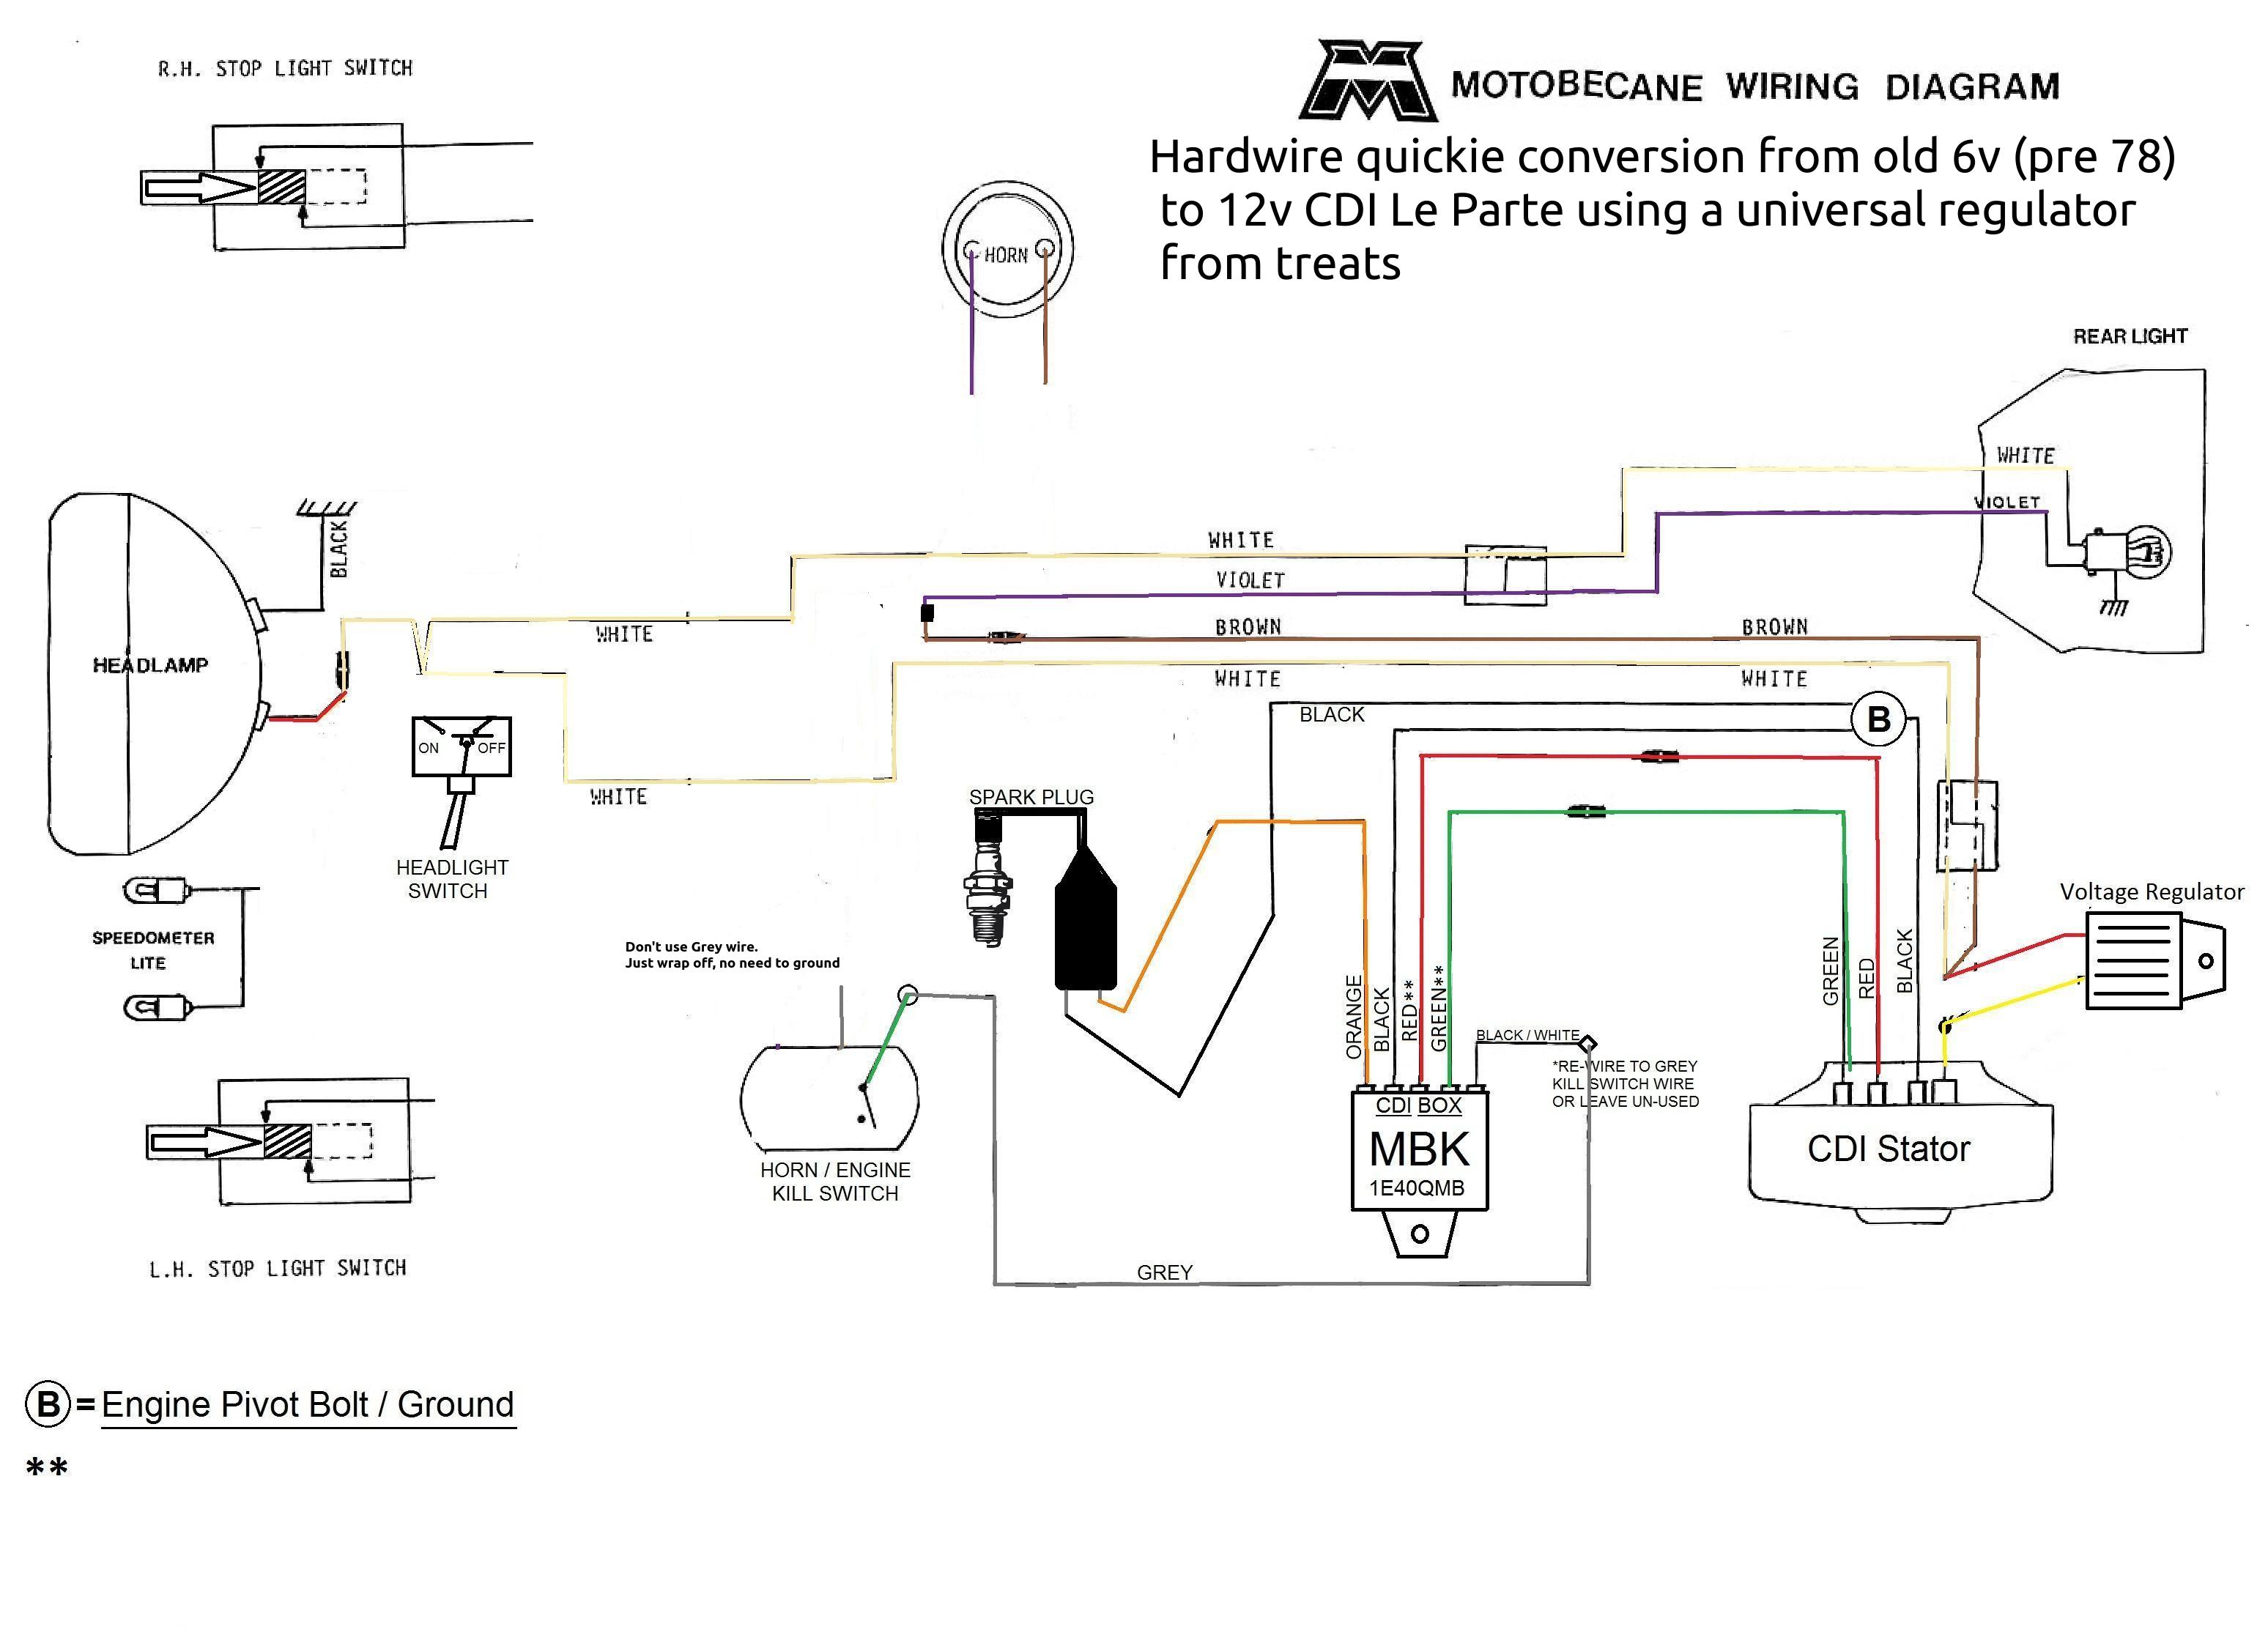 Motobecane wiring diagrams | Moped Wiki — Moped ArmyMoped Army